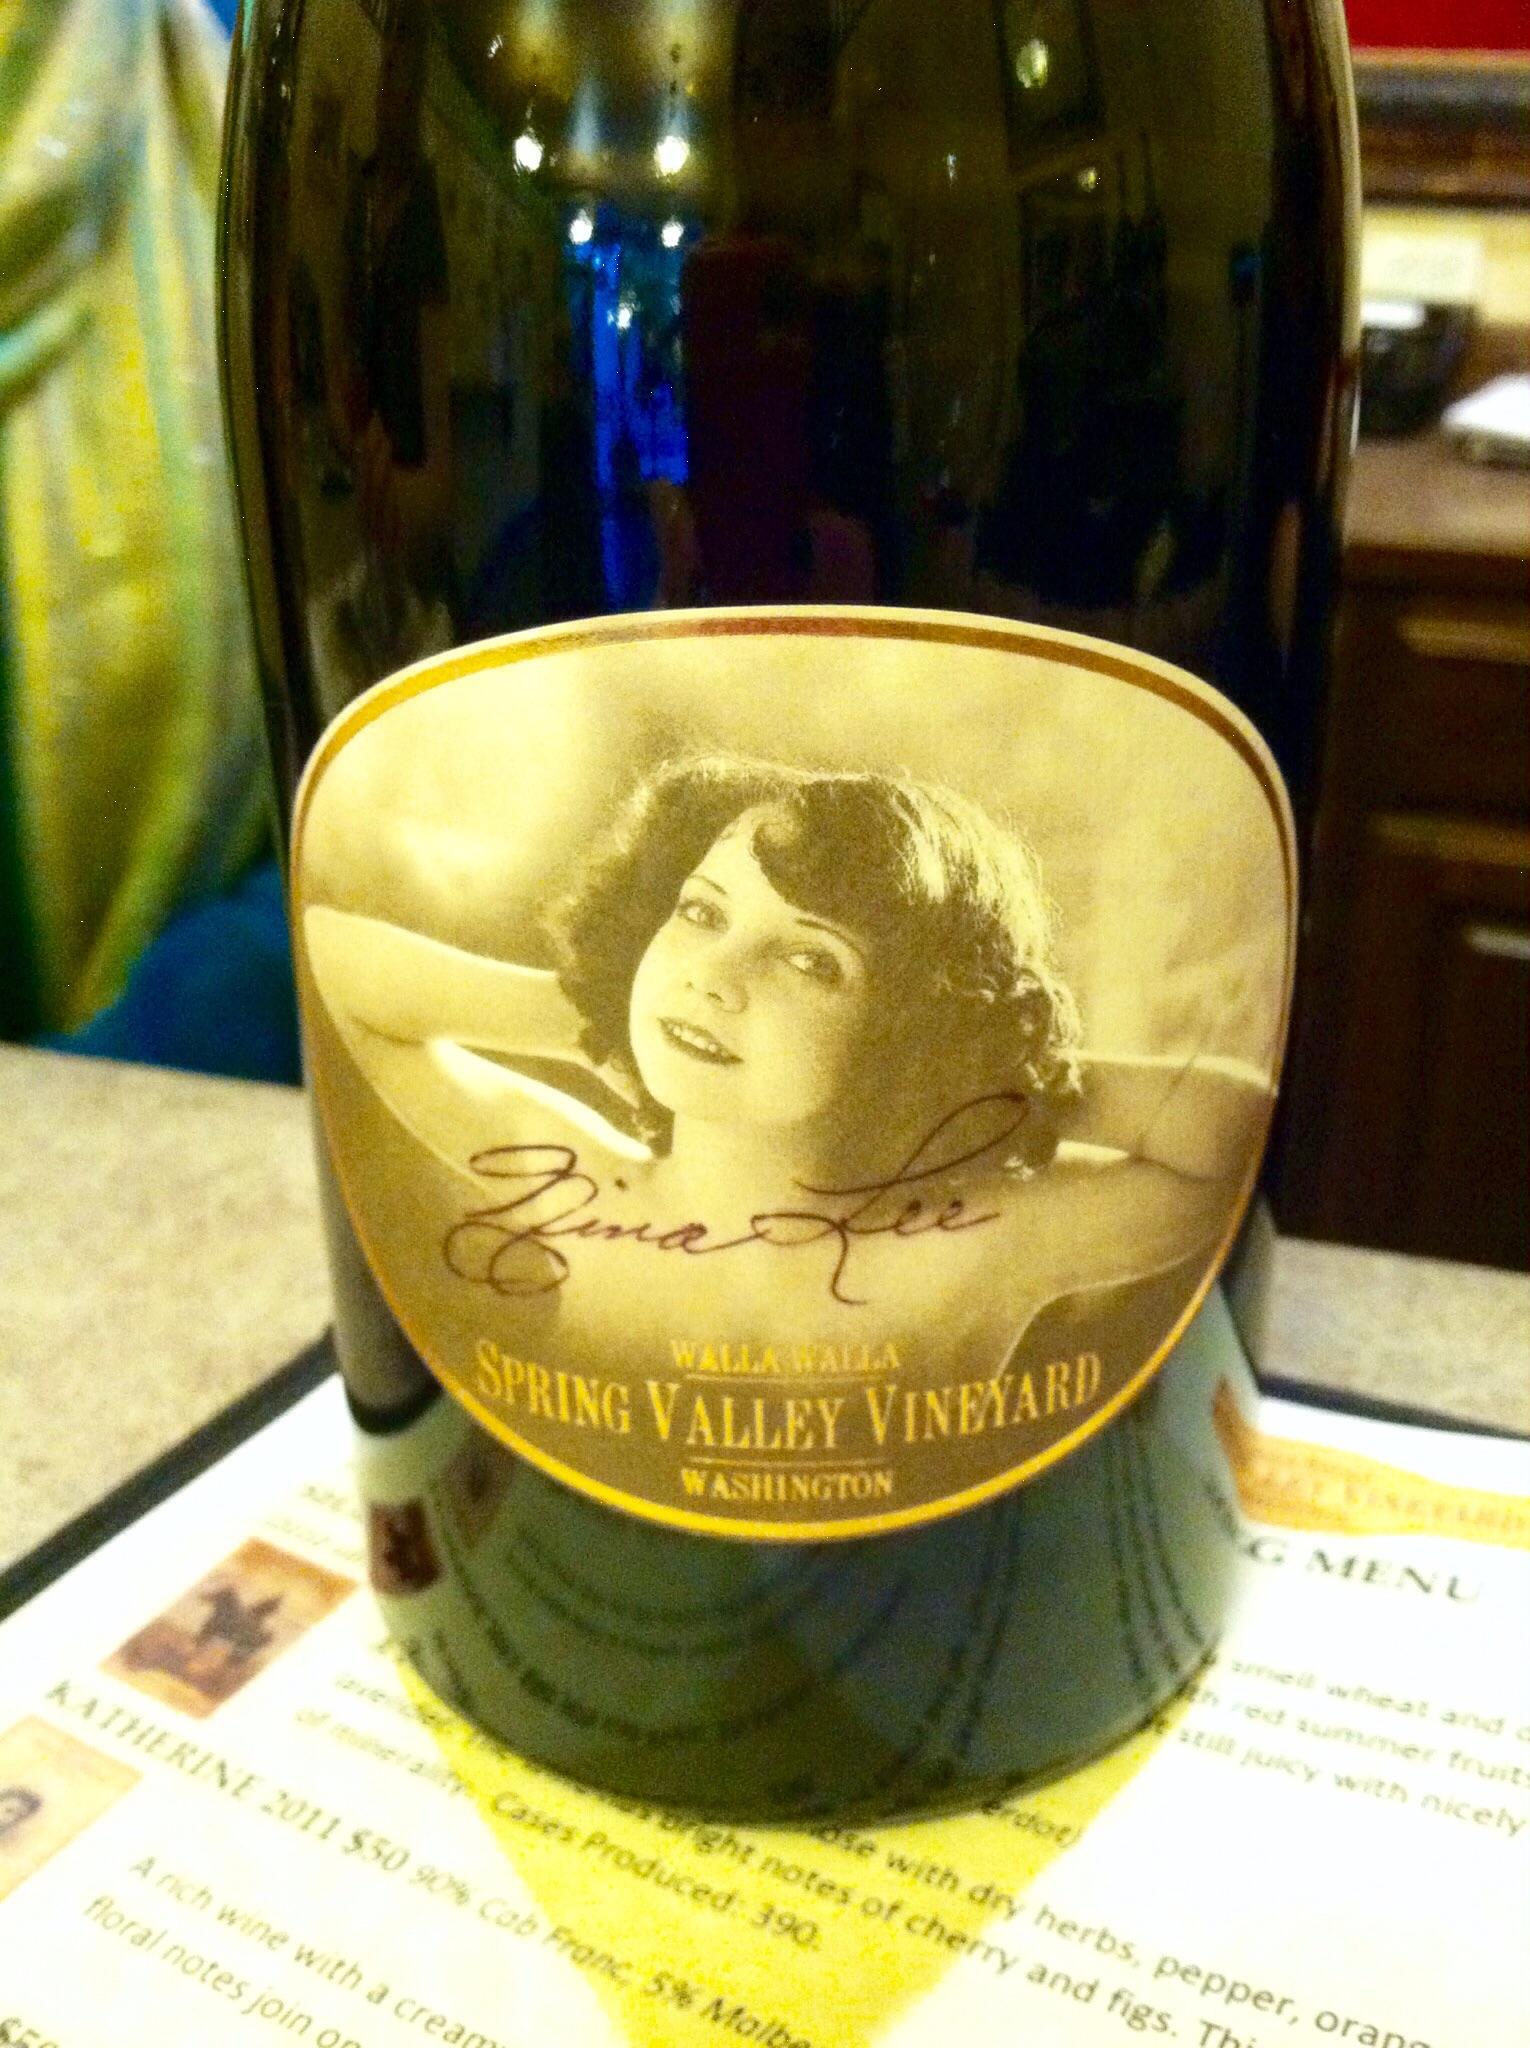 My favorite label - isn't she sassy? Photo by Shana Sokol, Shana Speaks Wine.